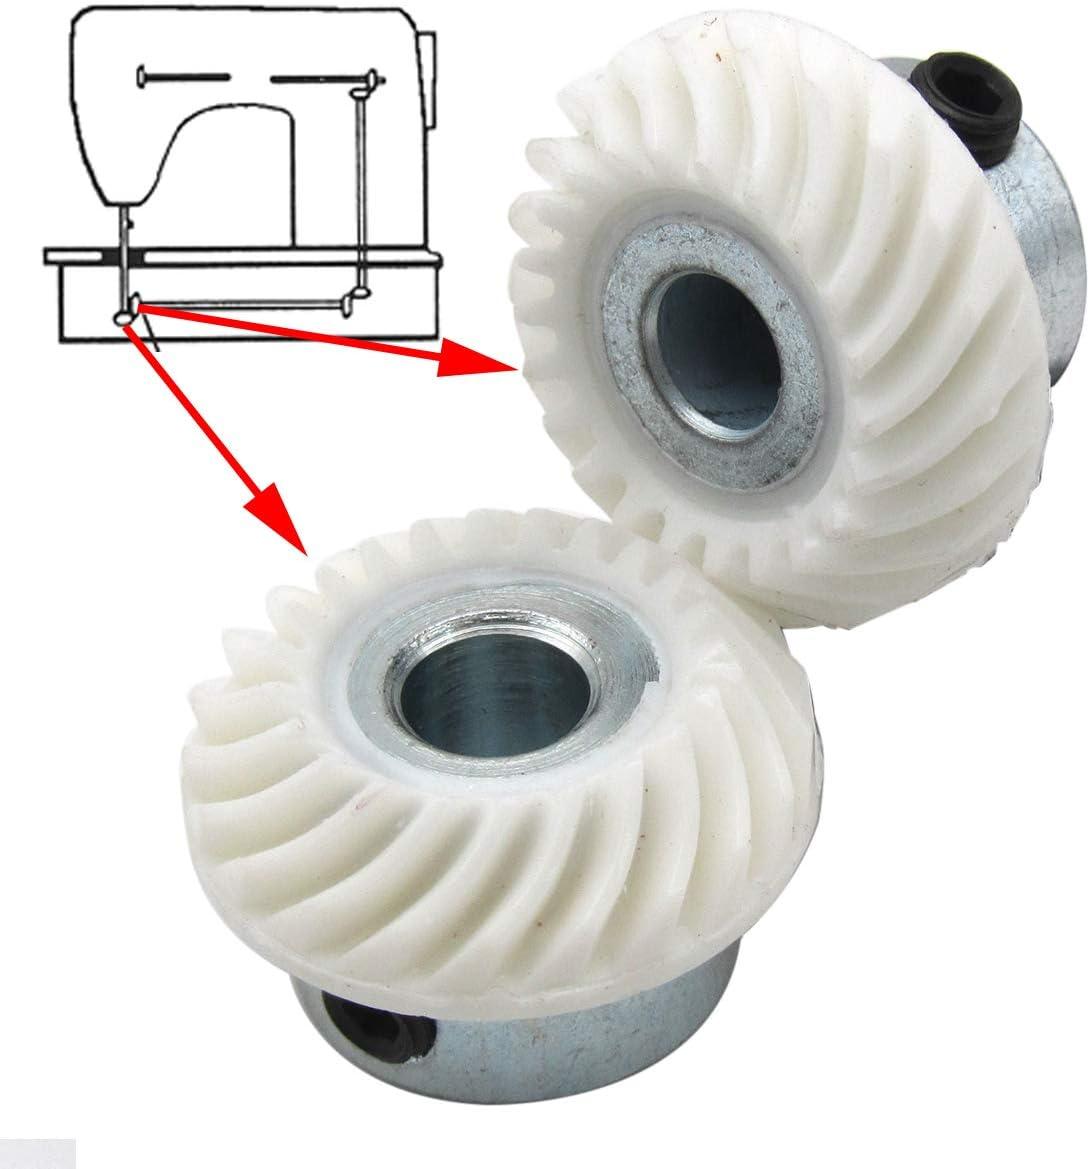 New Lower Horizontal Shaft Gear # 163997 fits Singer 500 800 6100 7100 Series